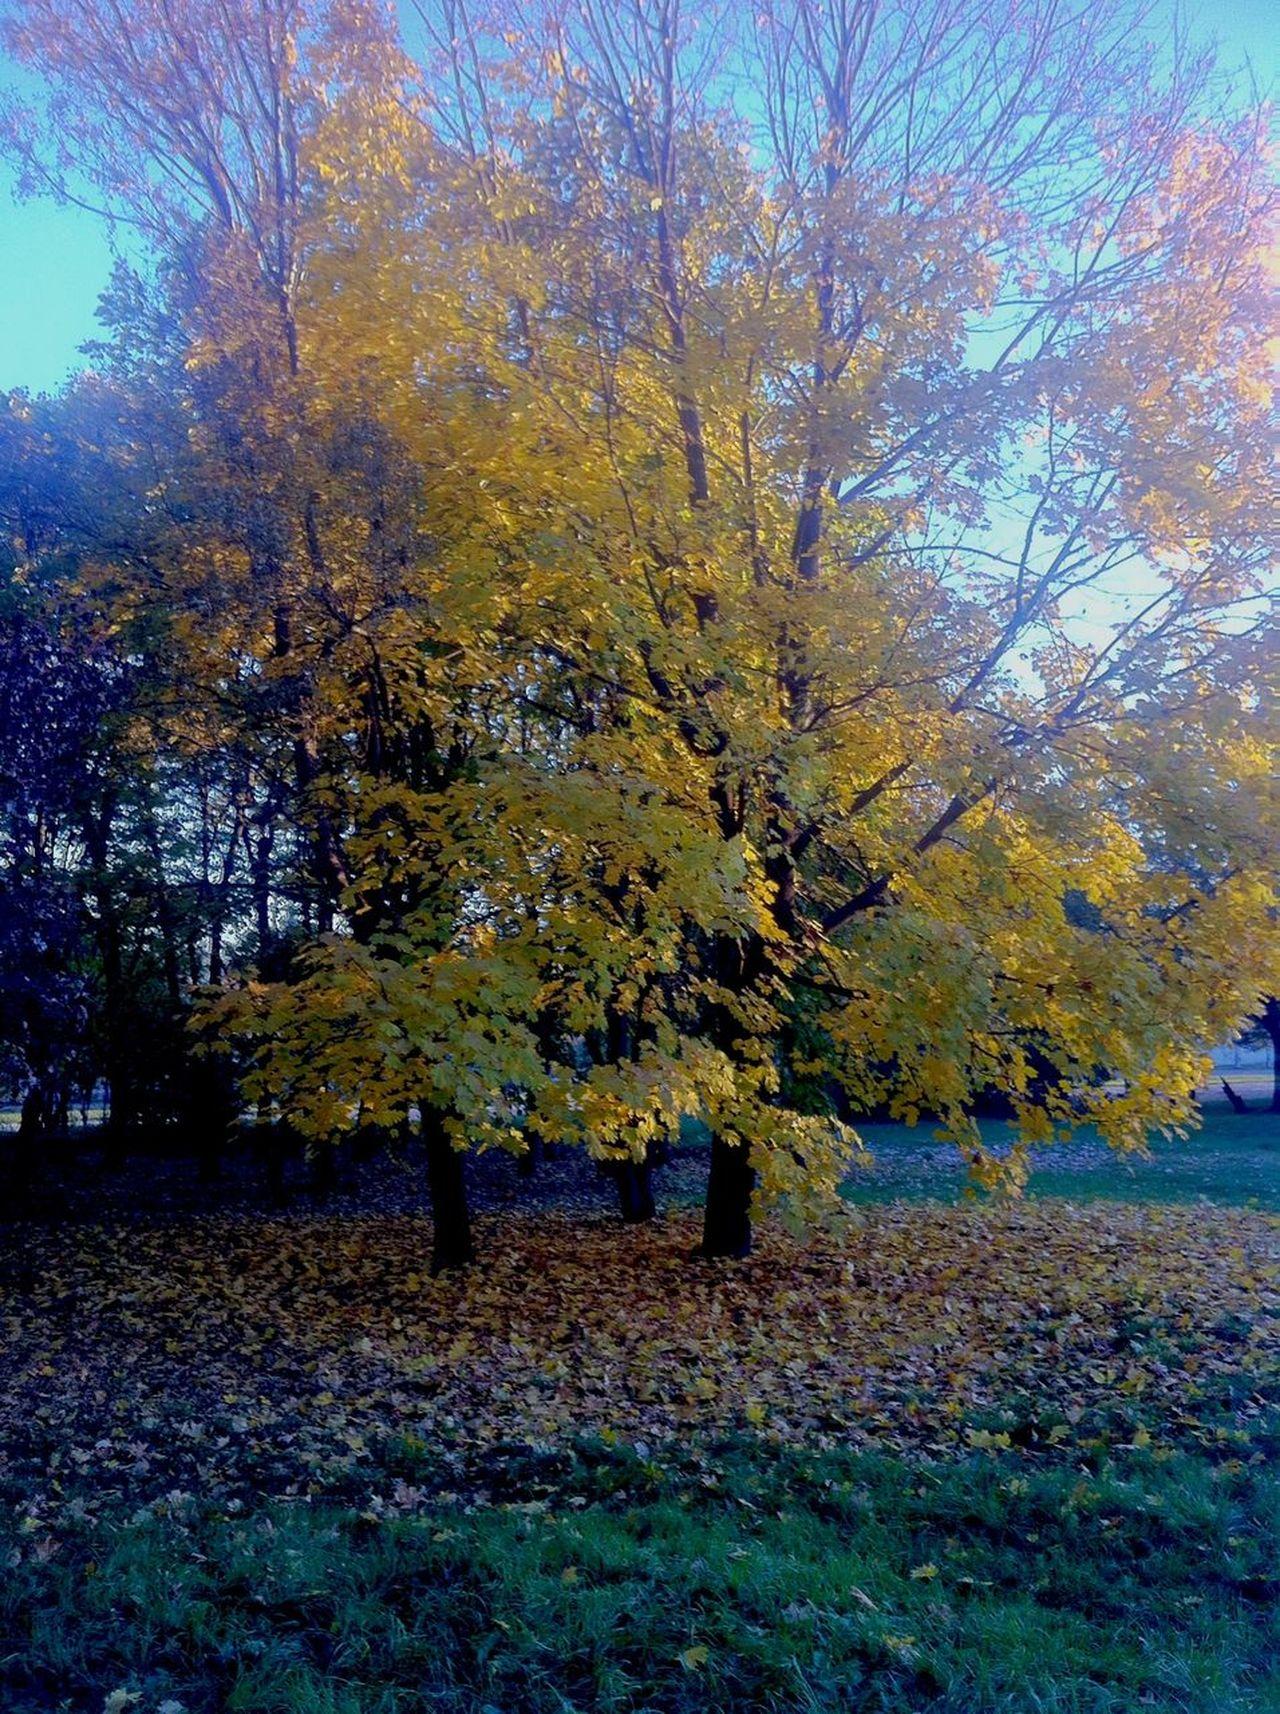 Autumn🍁🍁🍁 Fotografia Butiful Nature Good Day Mooring Autumn Leaves Good Times